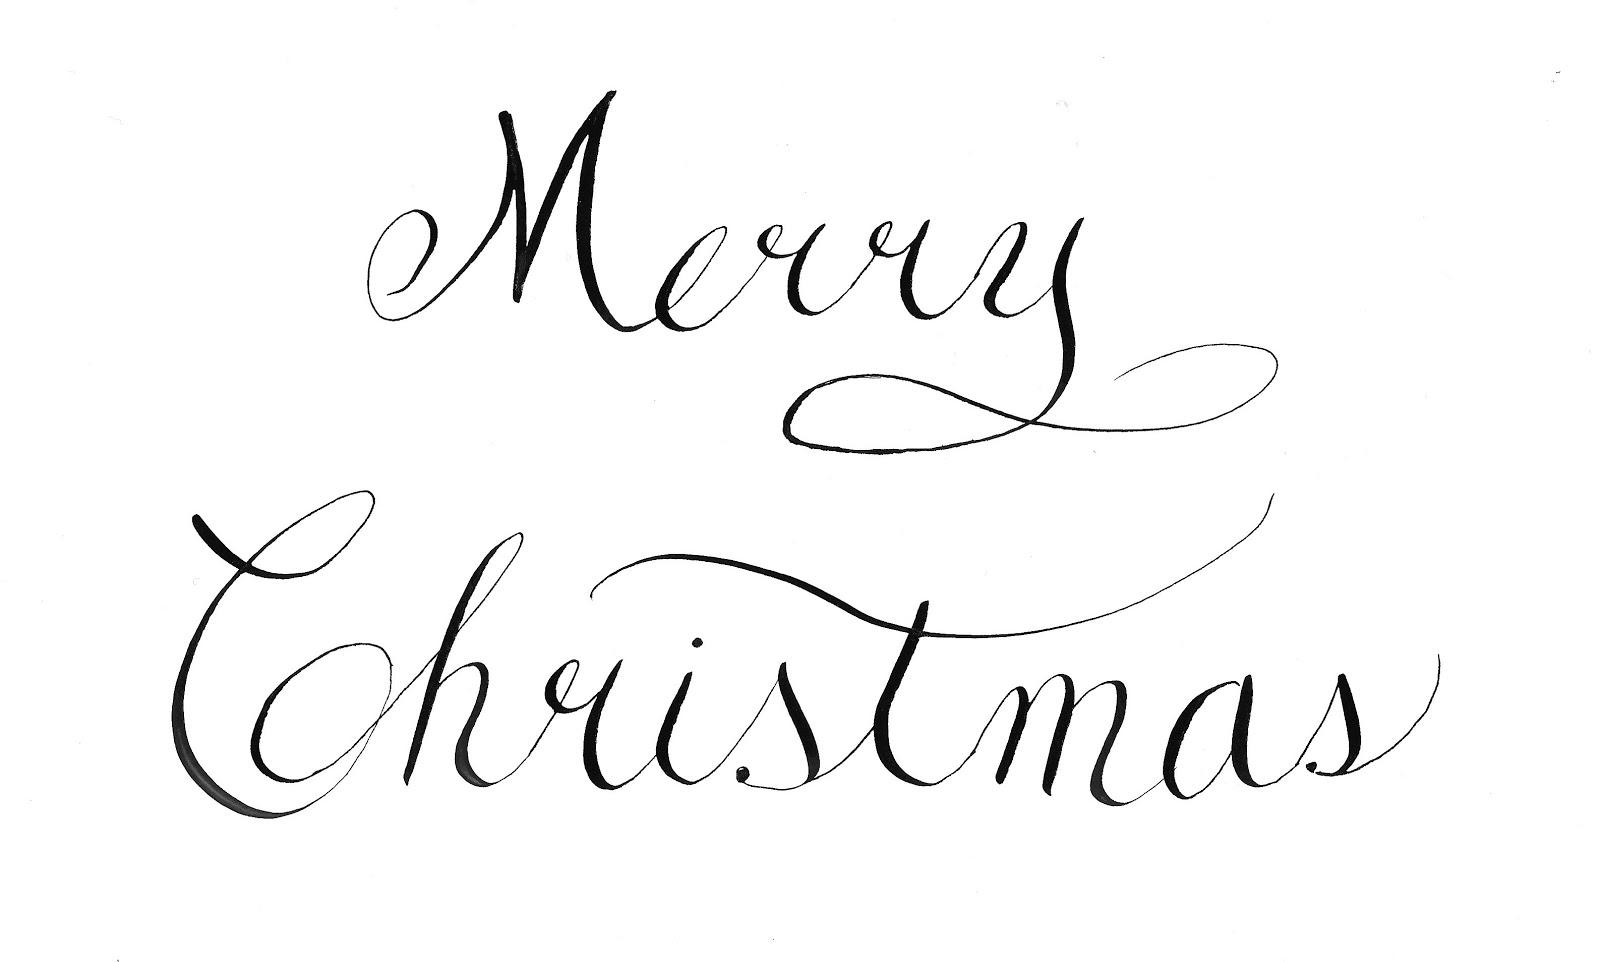 Merry Christmas Writing.Writing By Hand Merry Christmas